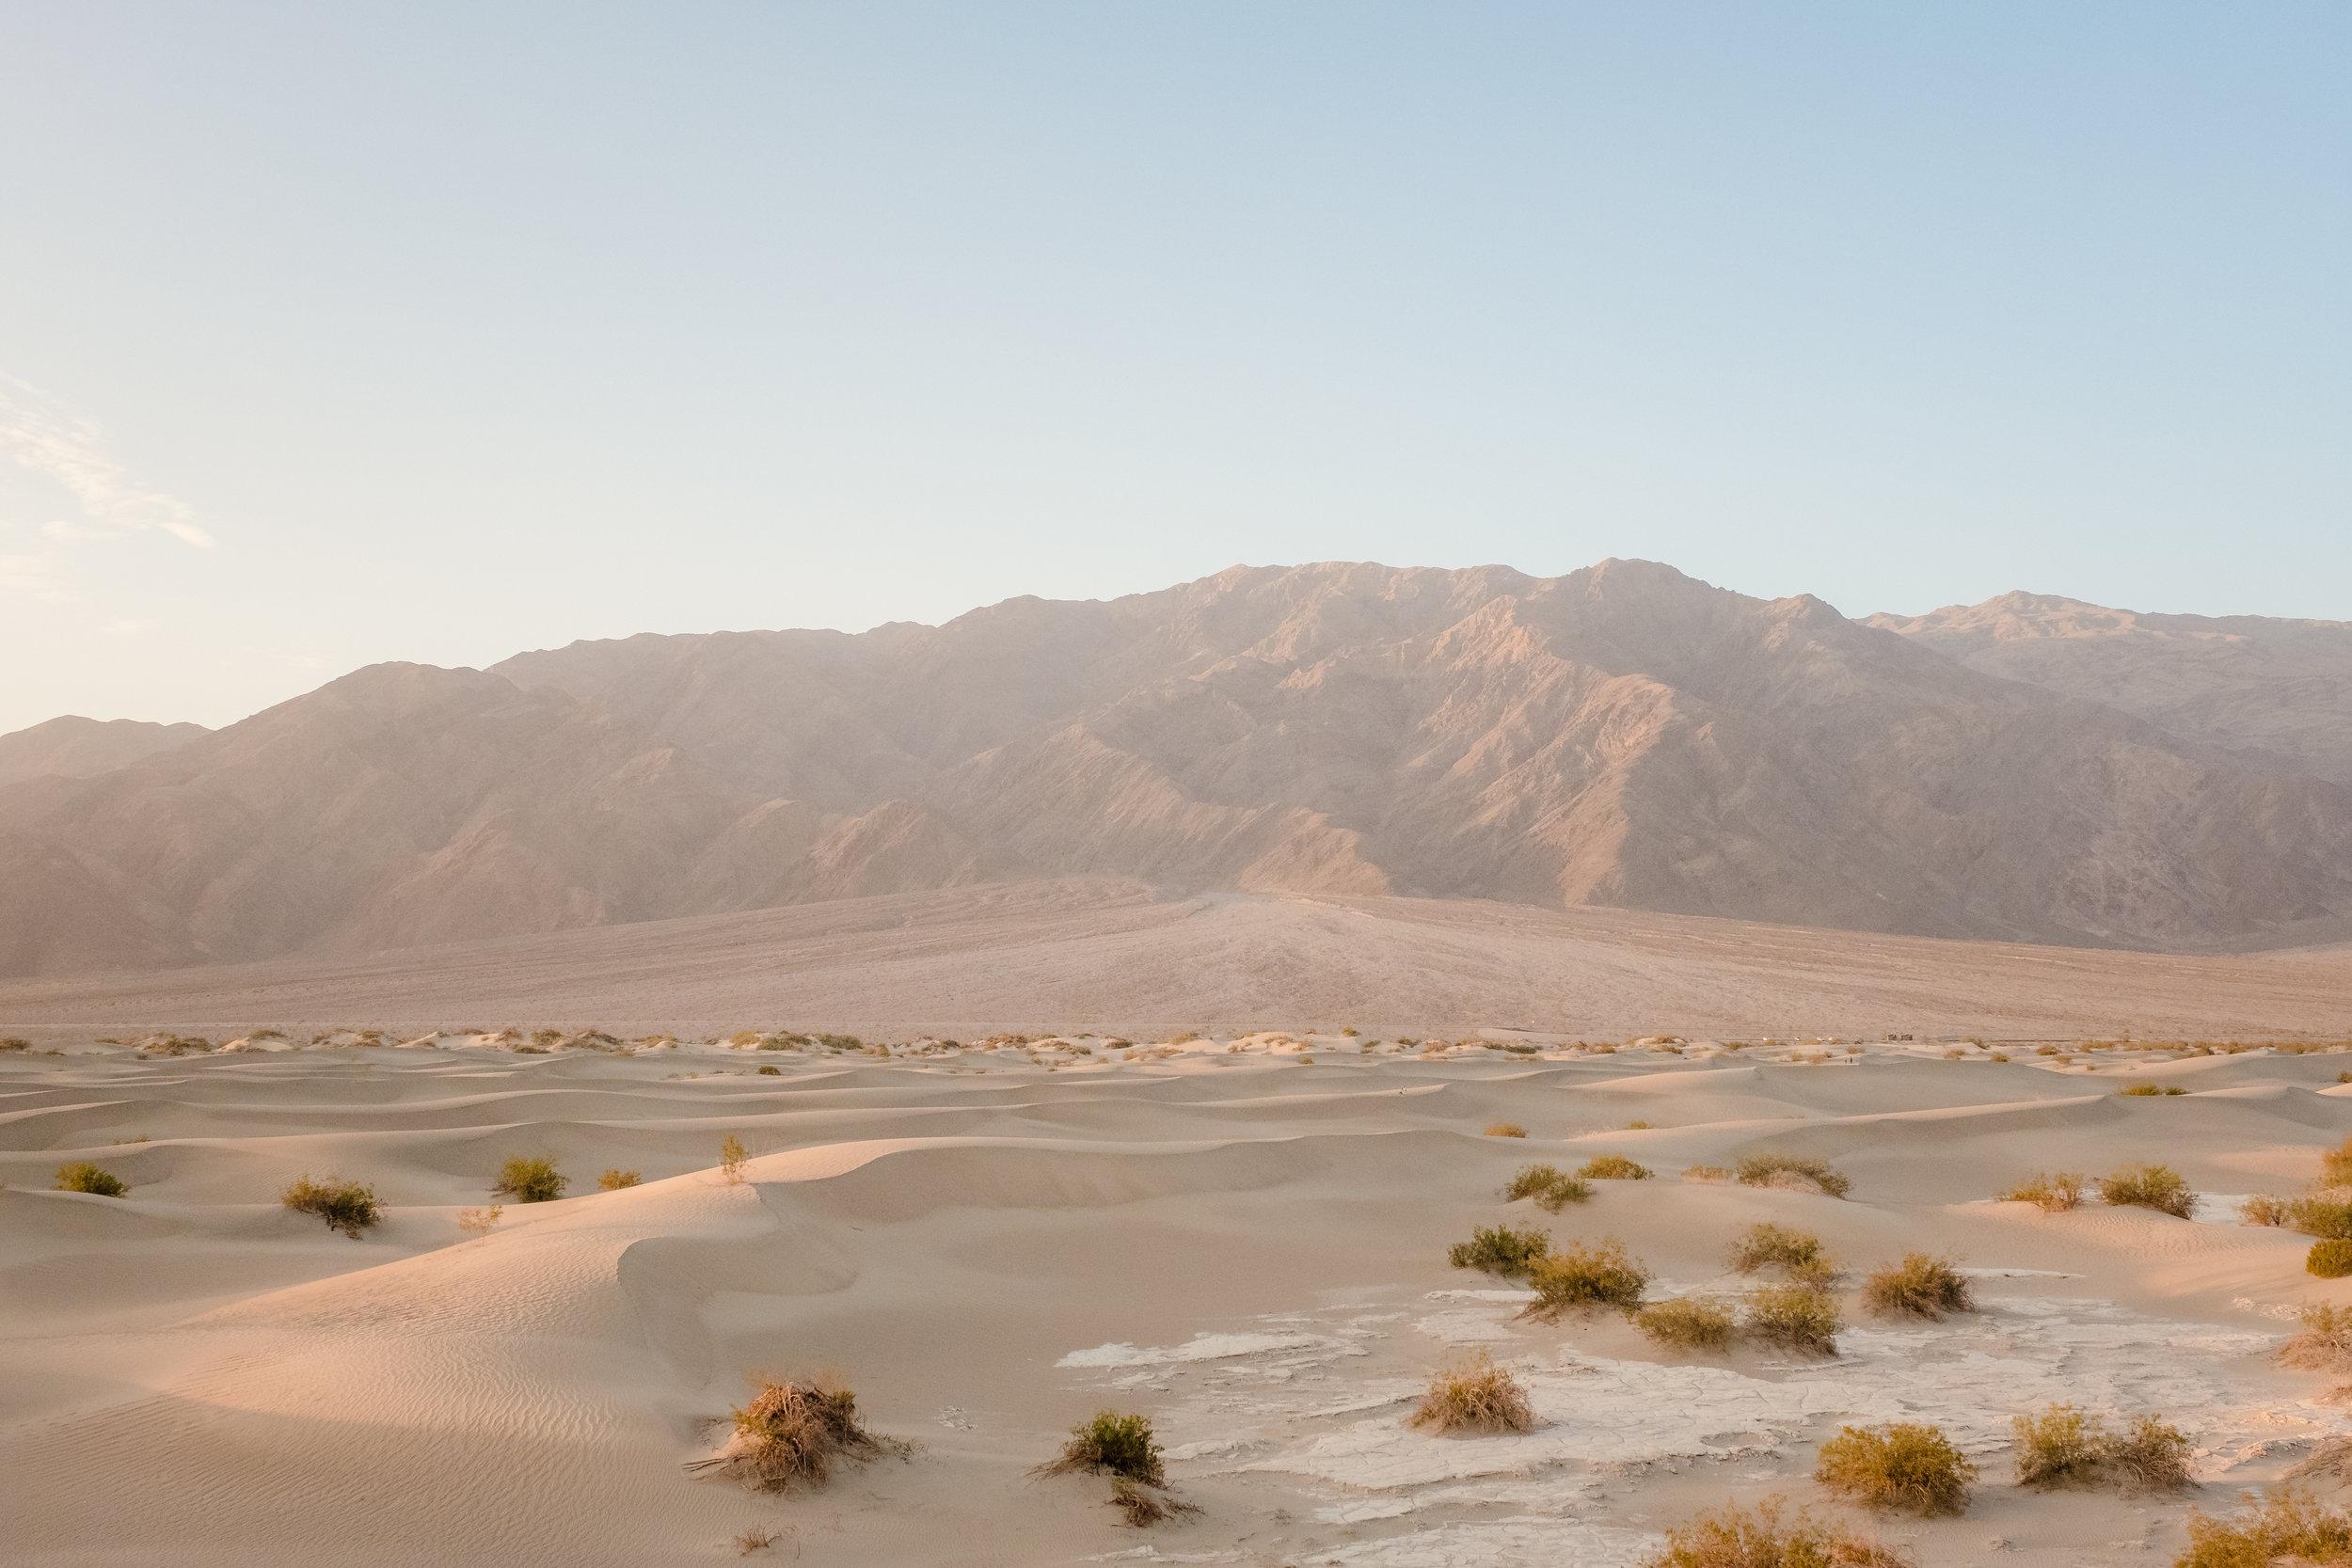 Death_Valley_National_Park9.jpg